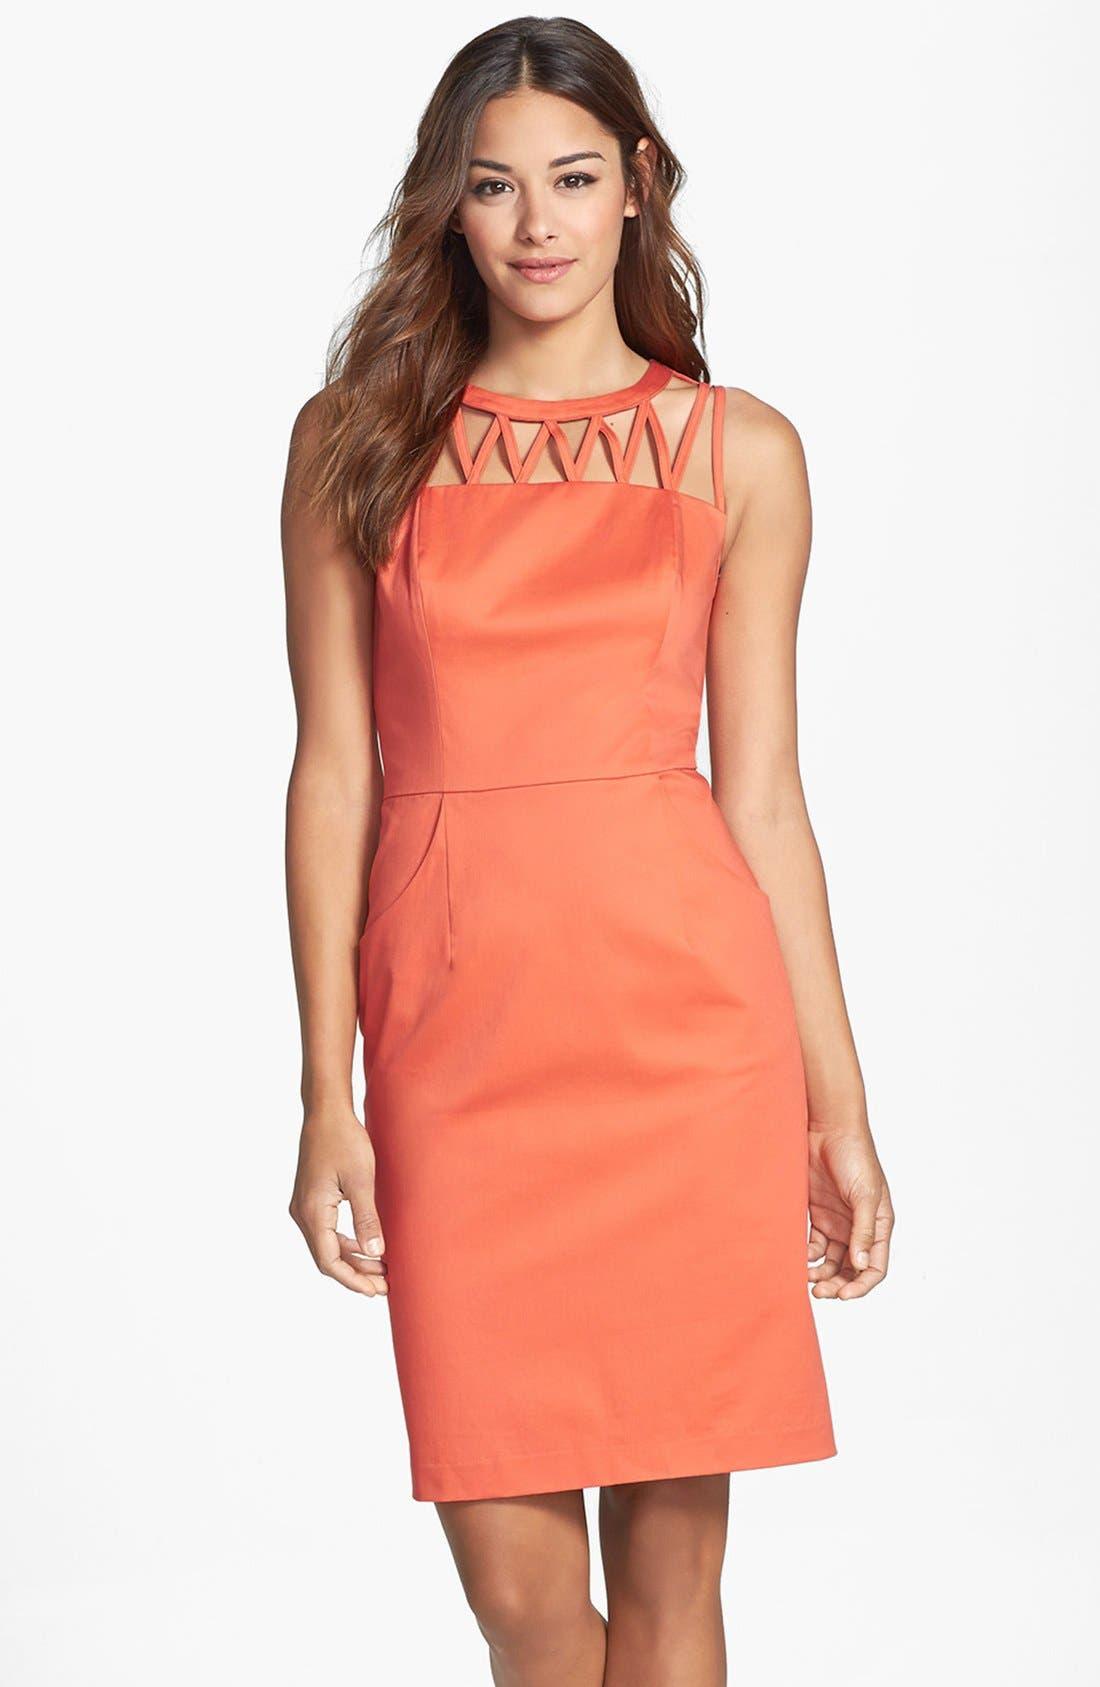 Alternate Image 1 Selected - Adrianna Papell Caged Yoke Stretch Cotton Sheath Dress